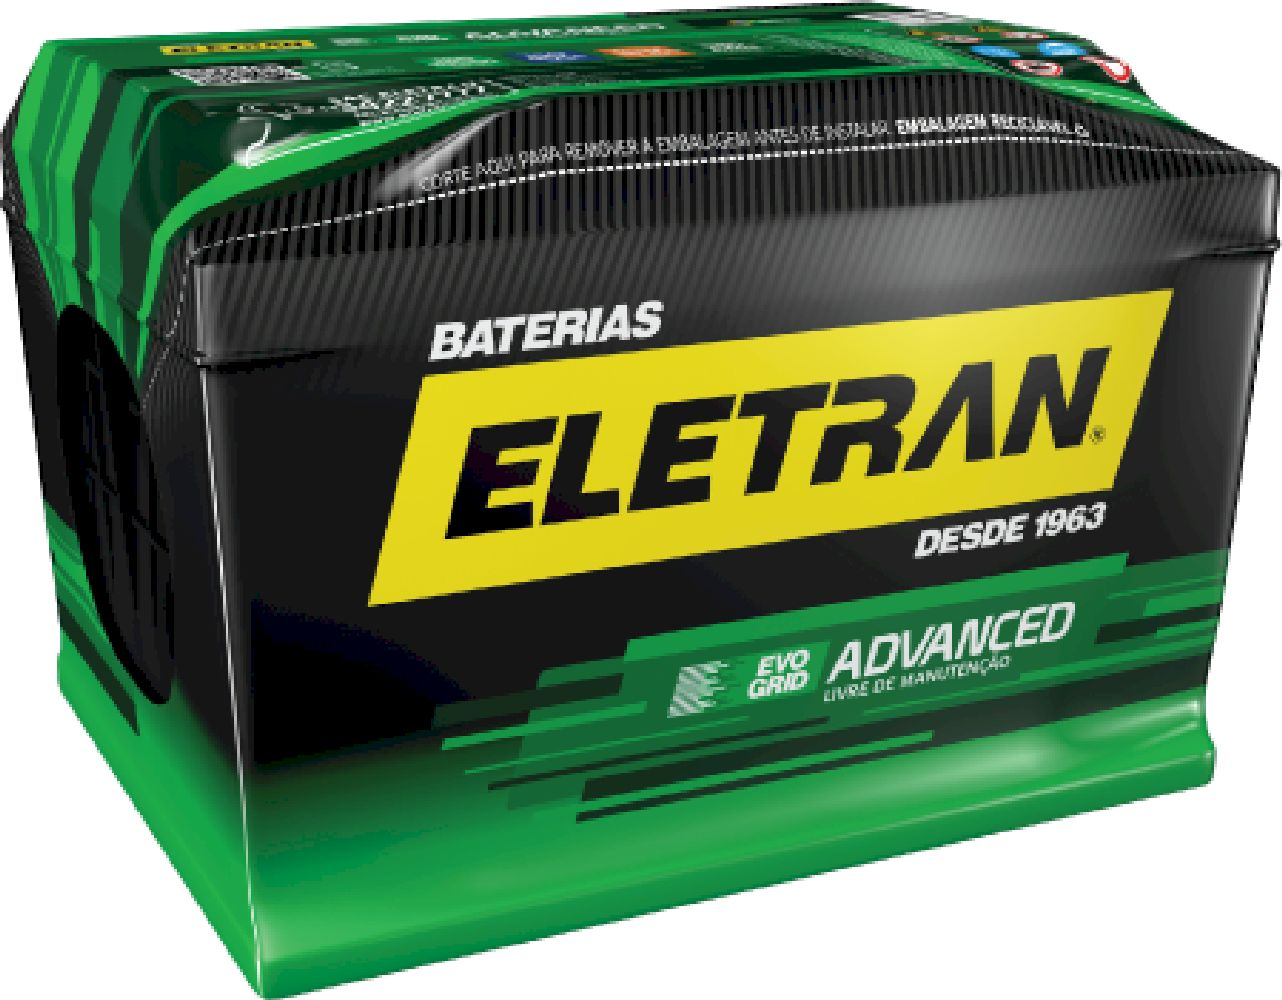 Bateria Automotiva Eletran Advanced - 70 PD